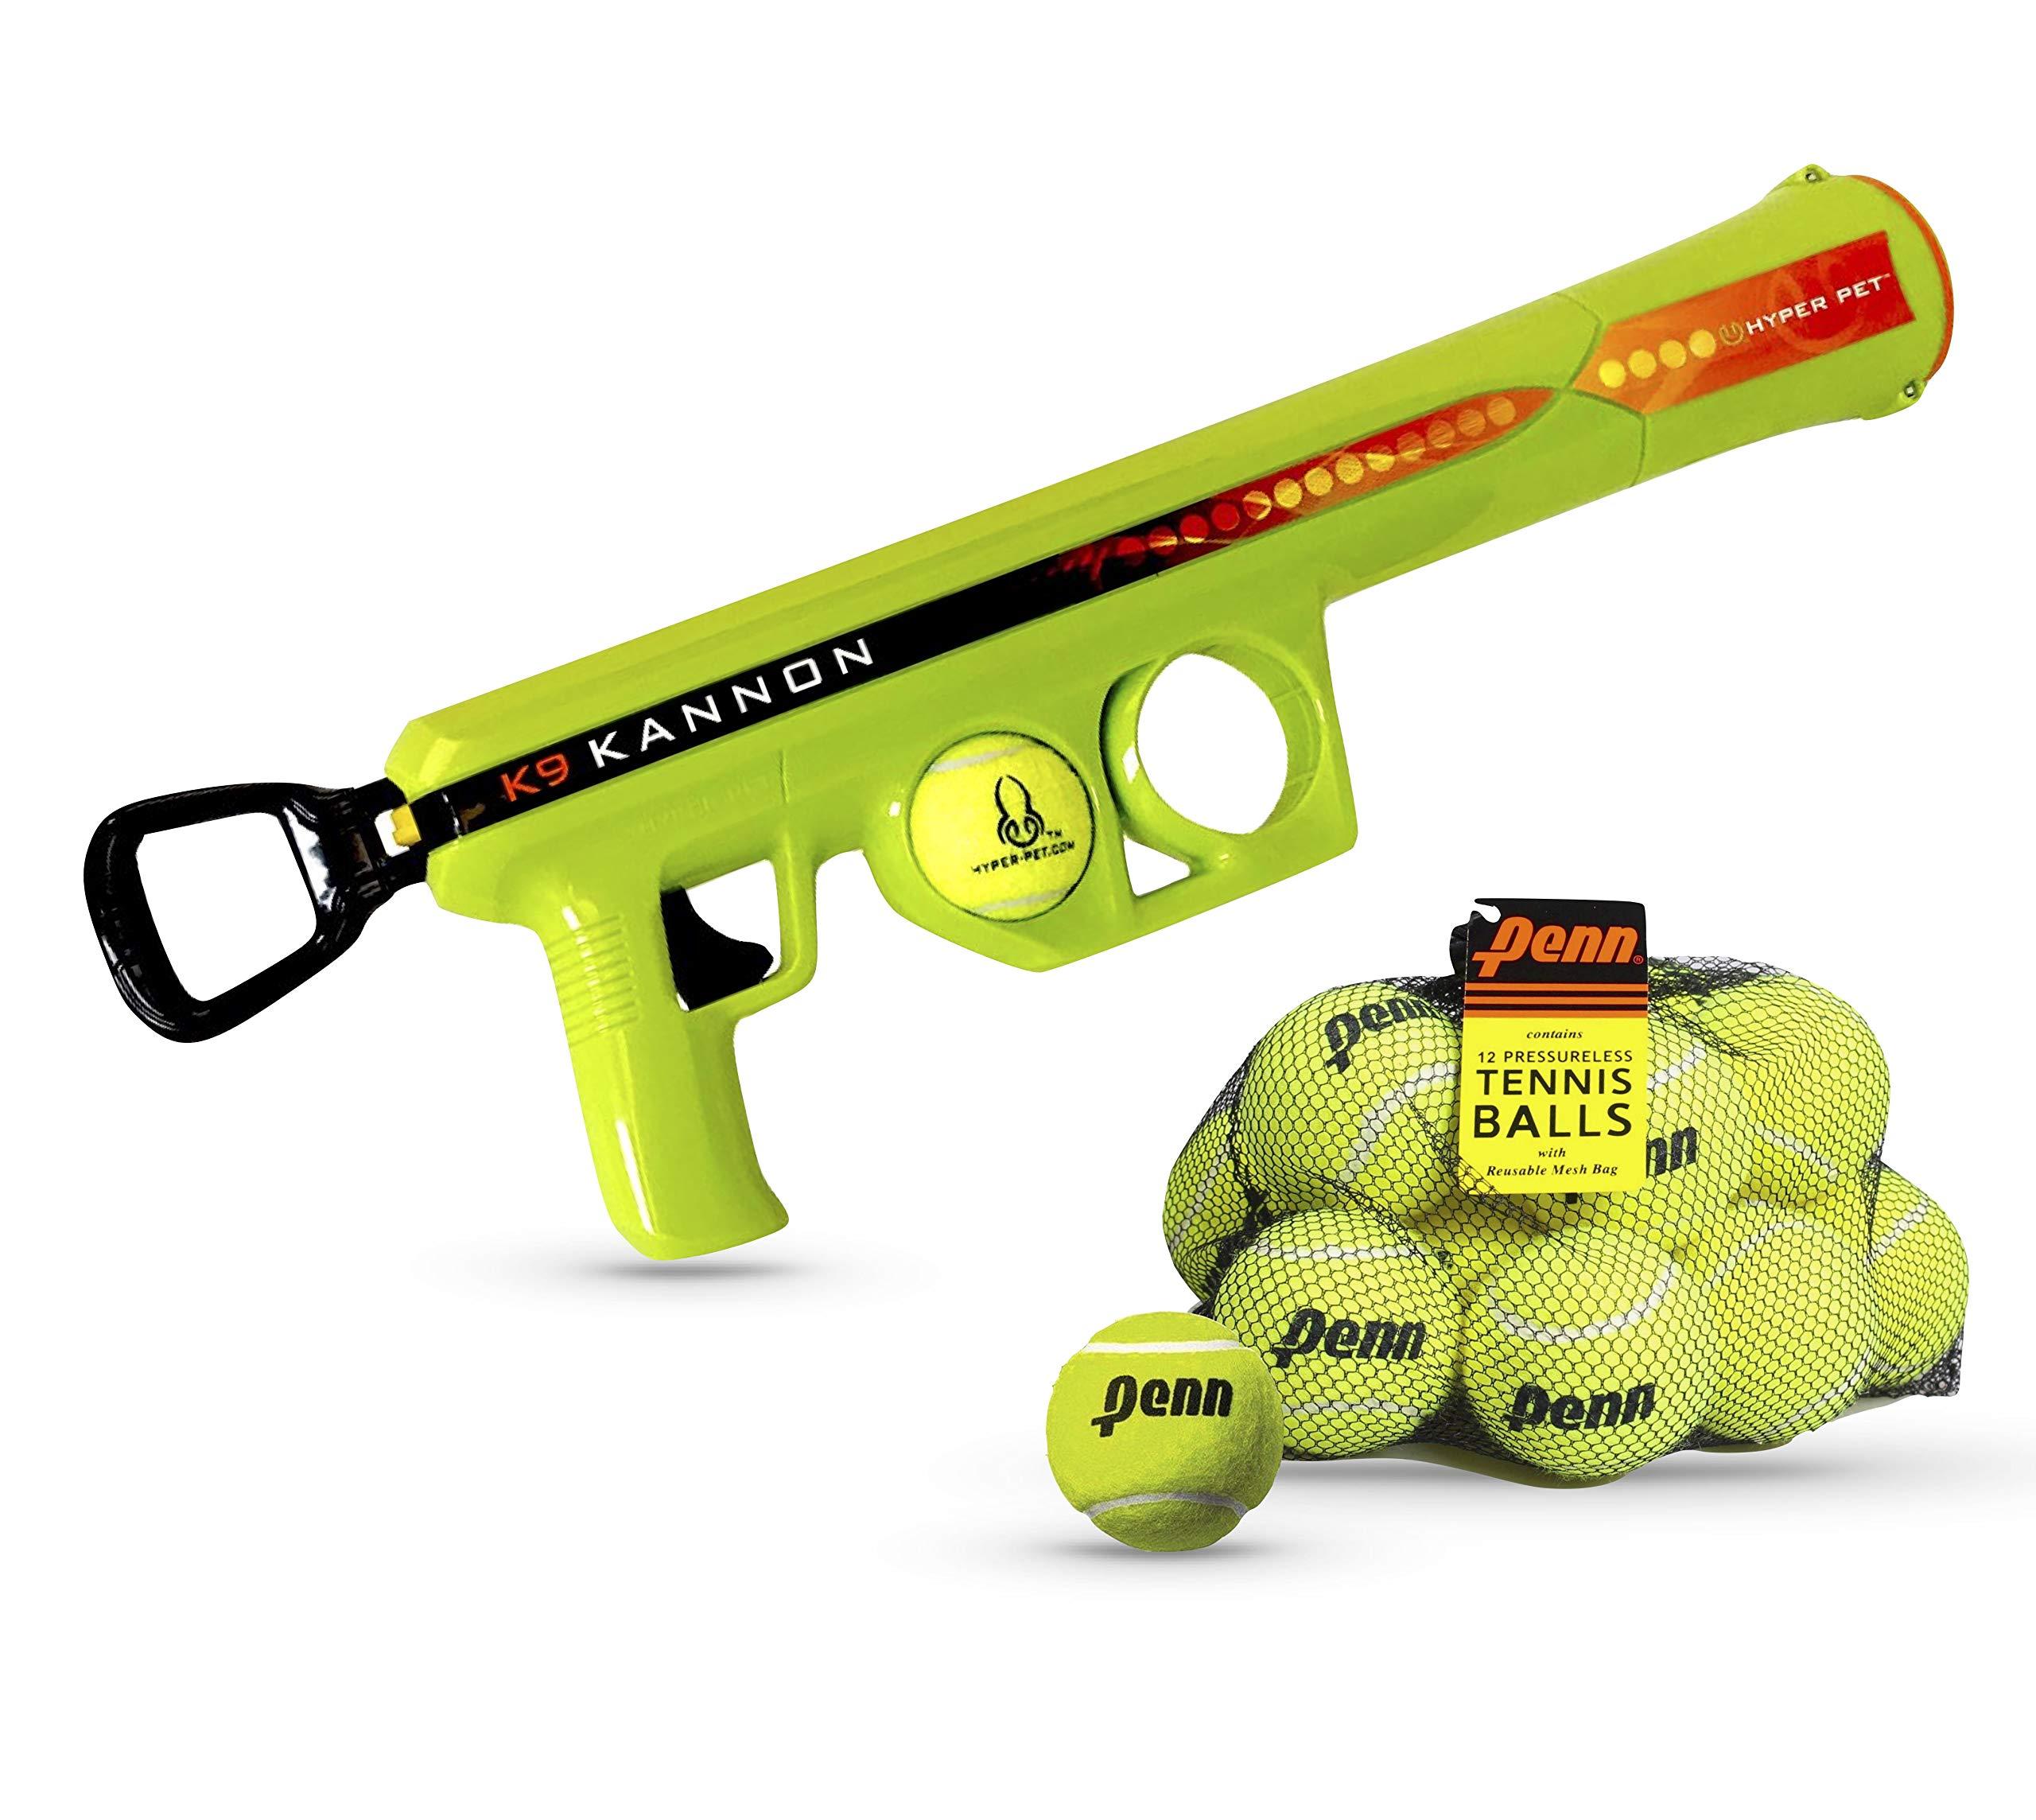 Sonship & Abundance K9 Kannon Ball Launcher and 12 Pack Tennis Balls   Fun Dog Toy Bundle for Shooting Balls far by Sonship & Abundance